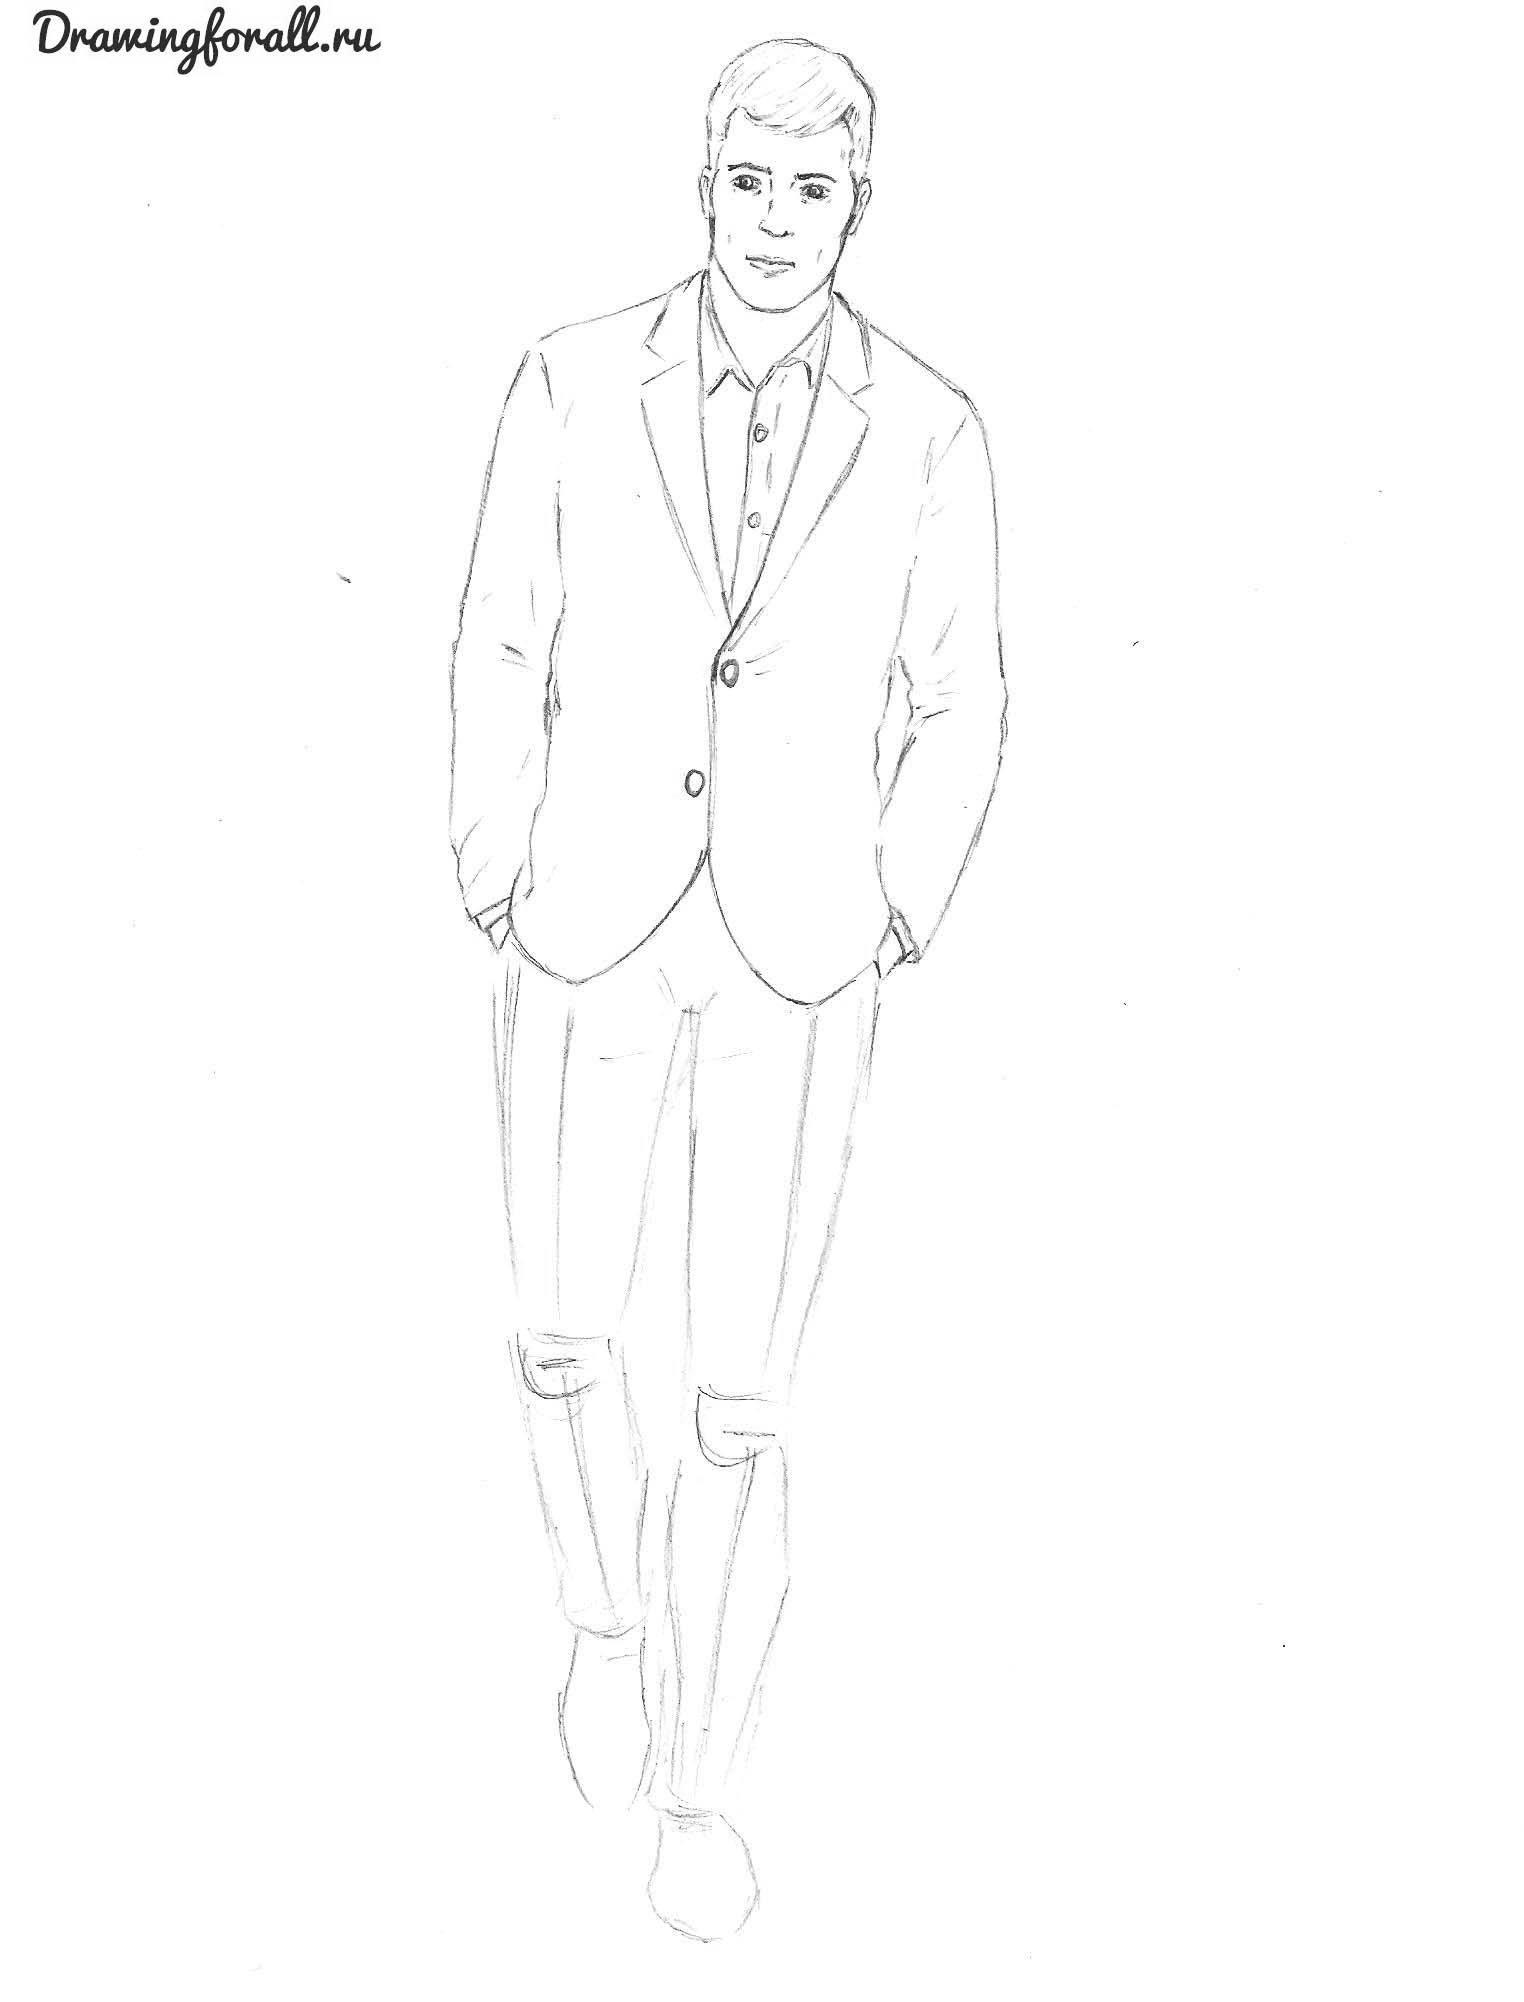 Картинка человека нарисованная карандашом